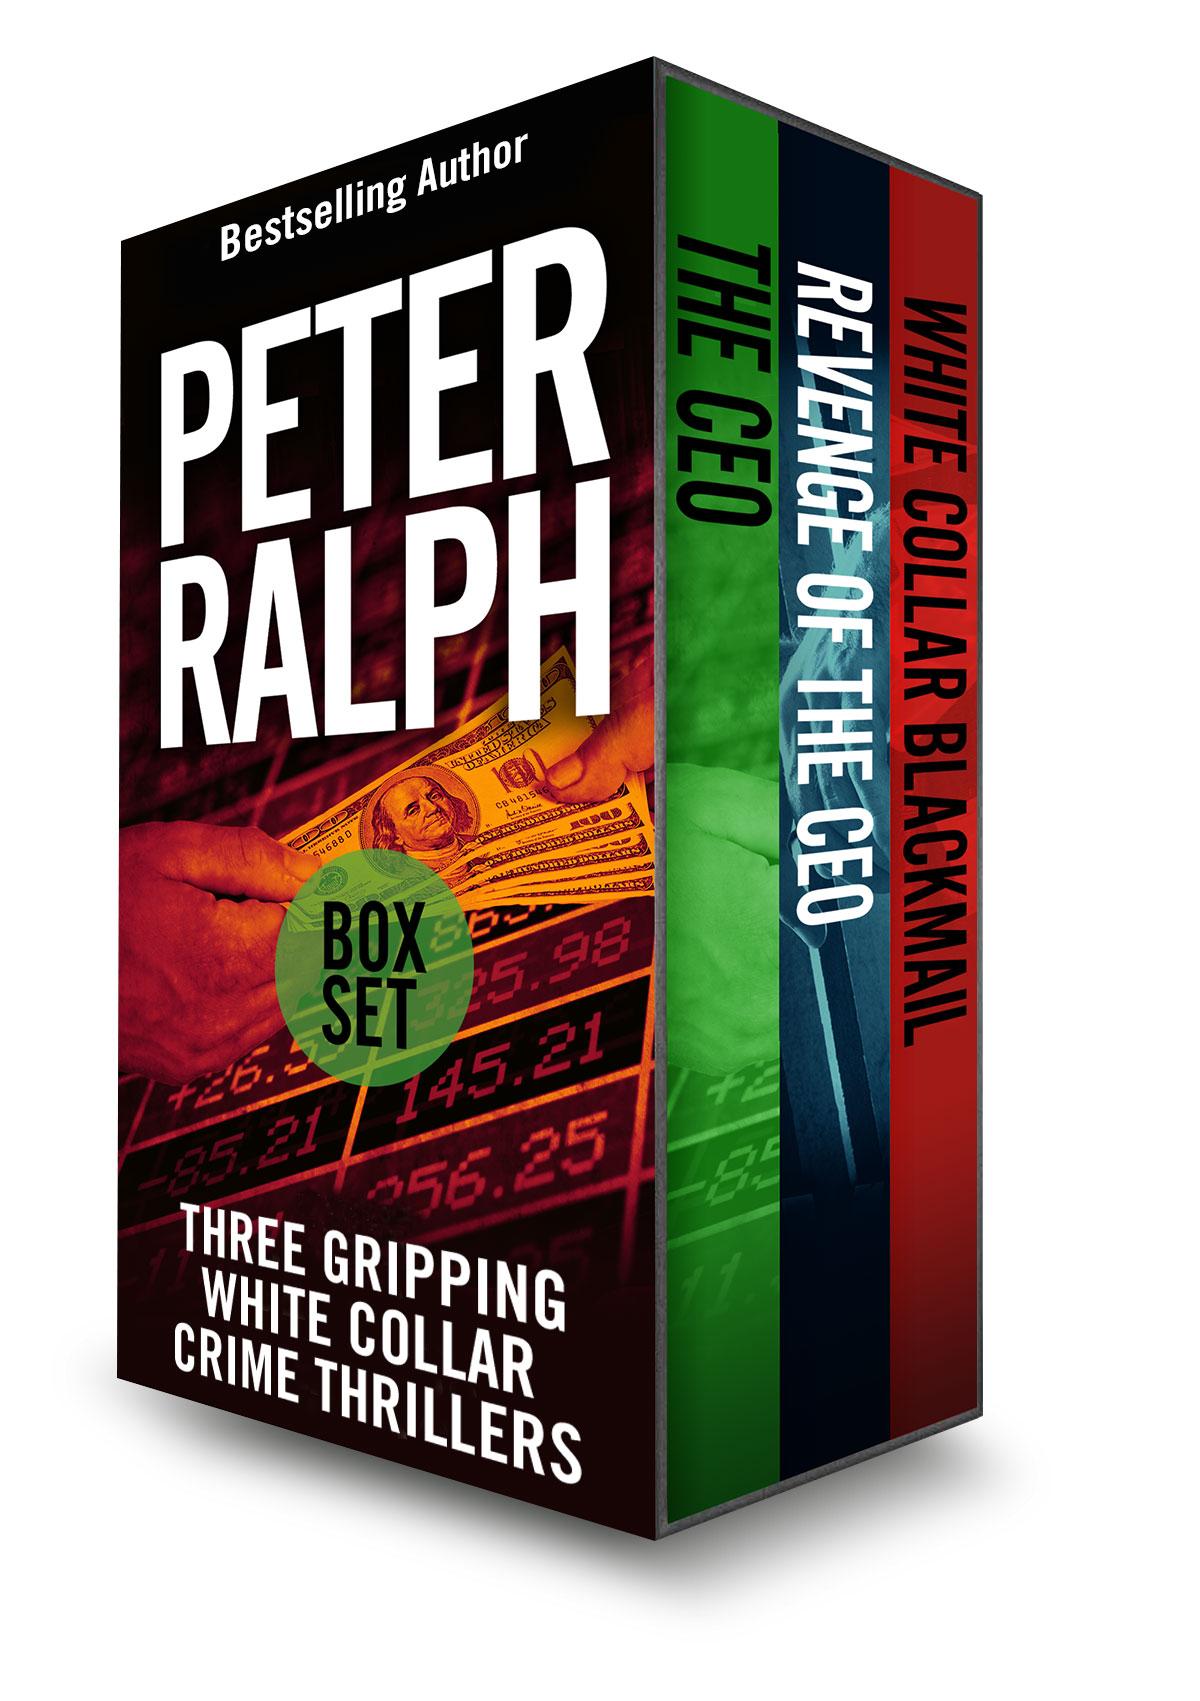 Peter-Ralph-box-set_three-titles.jpg